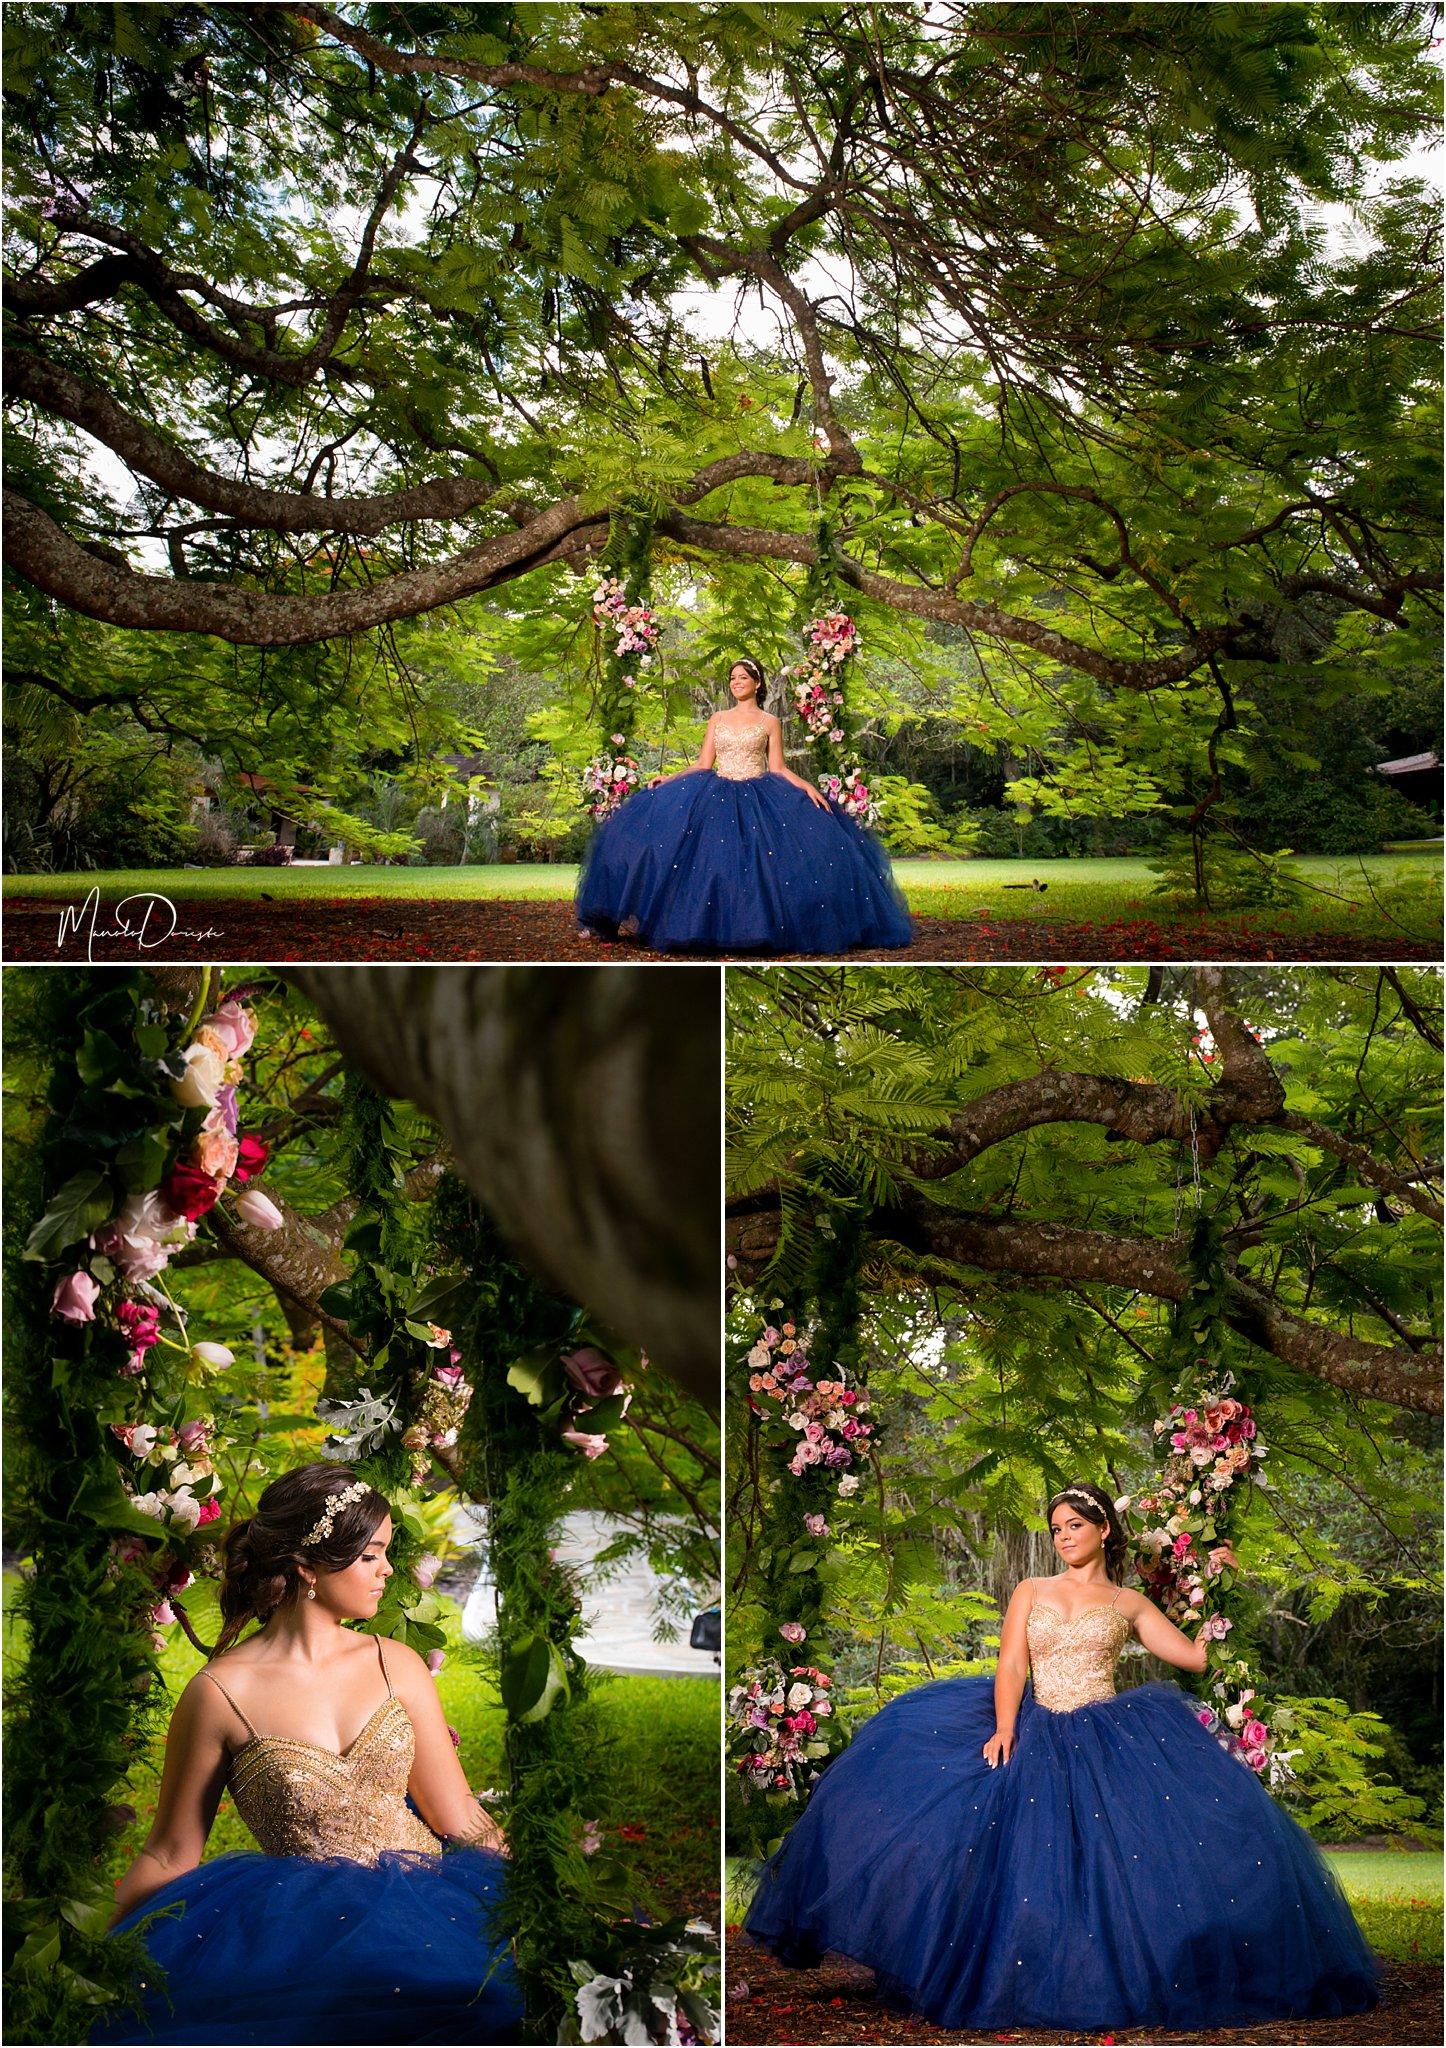 0336_ManoloDoreste_InFocusStudios_Wedding_Family_Photography_Miami_MiamiPhotographer.jpg